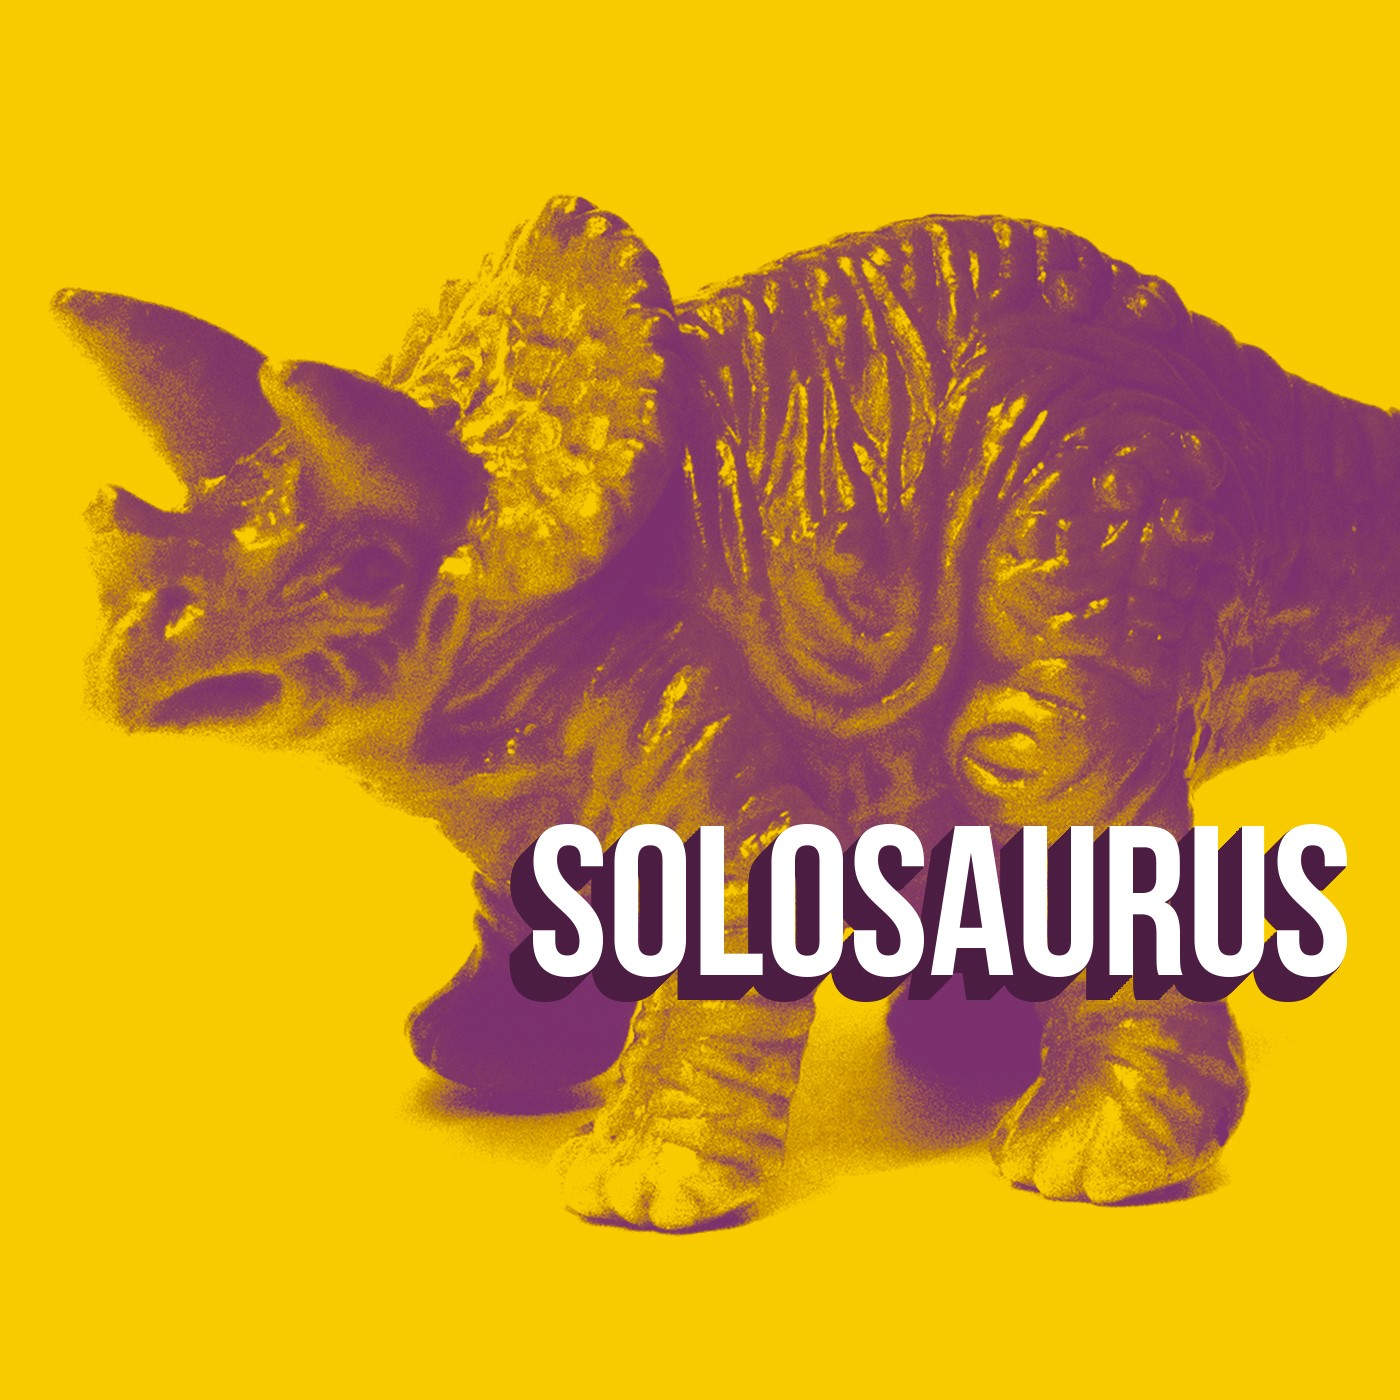 Solosaurus show art